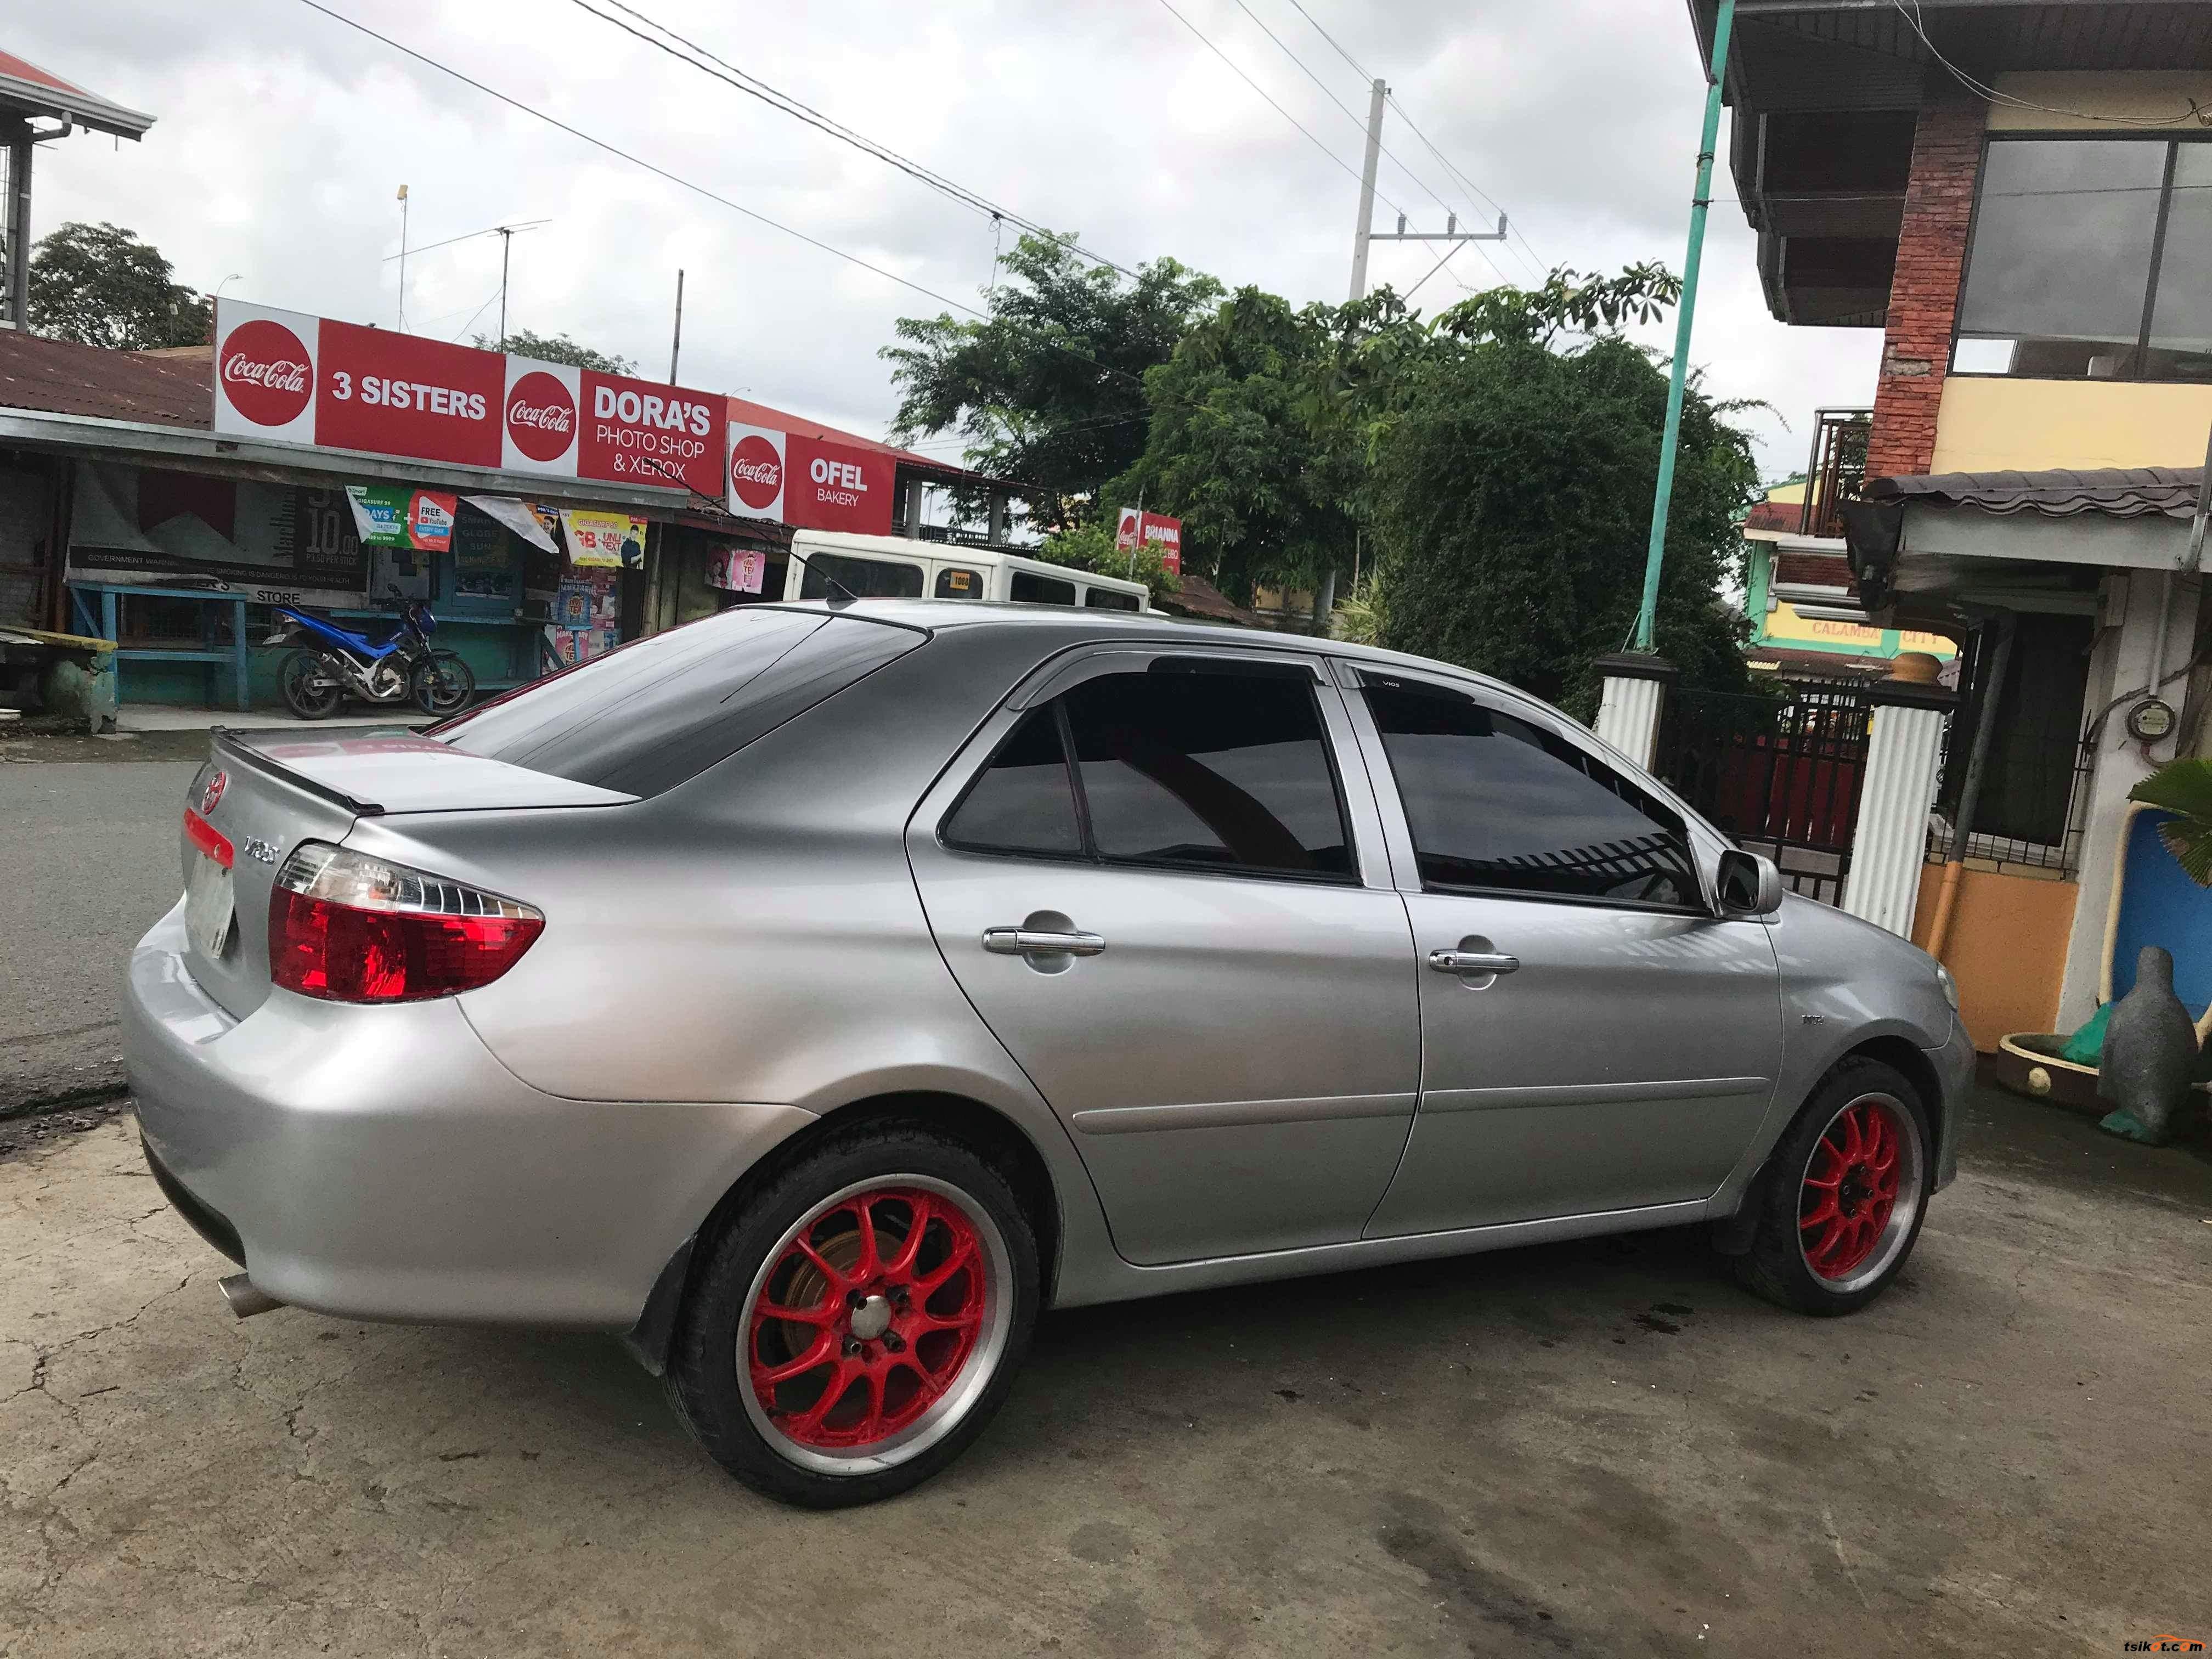 Toyota Vios 2003 - 3